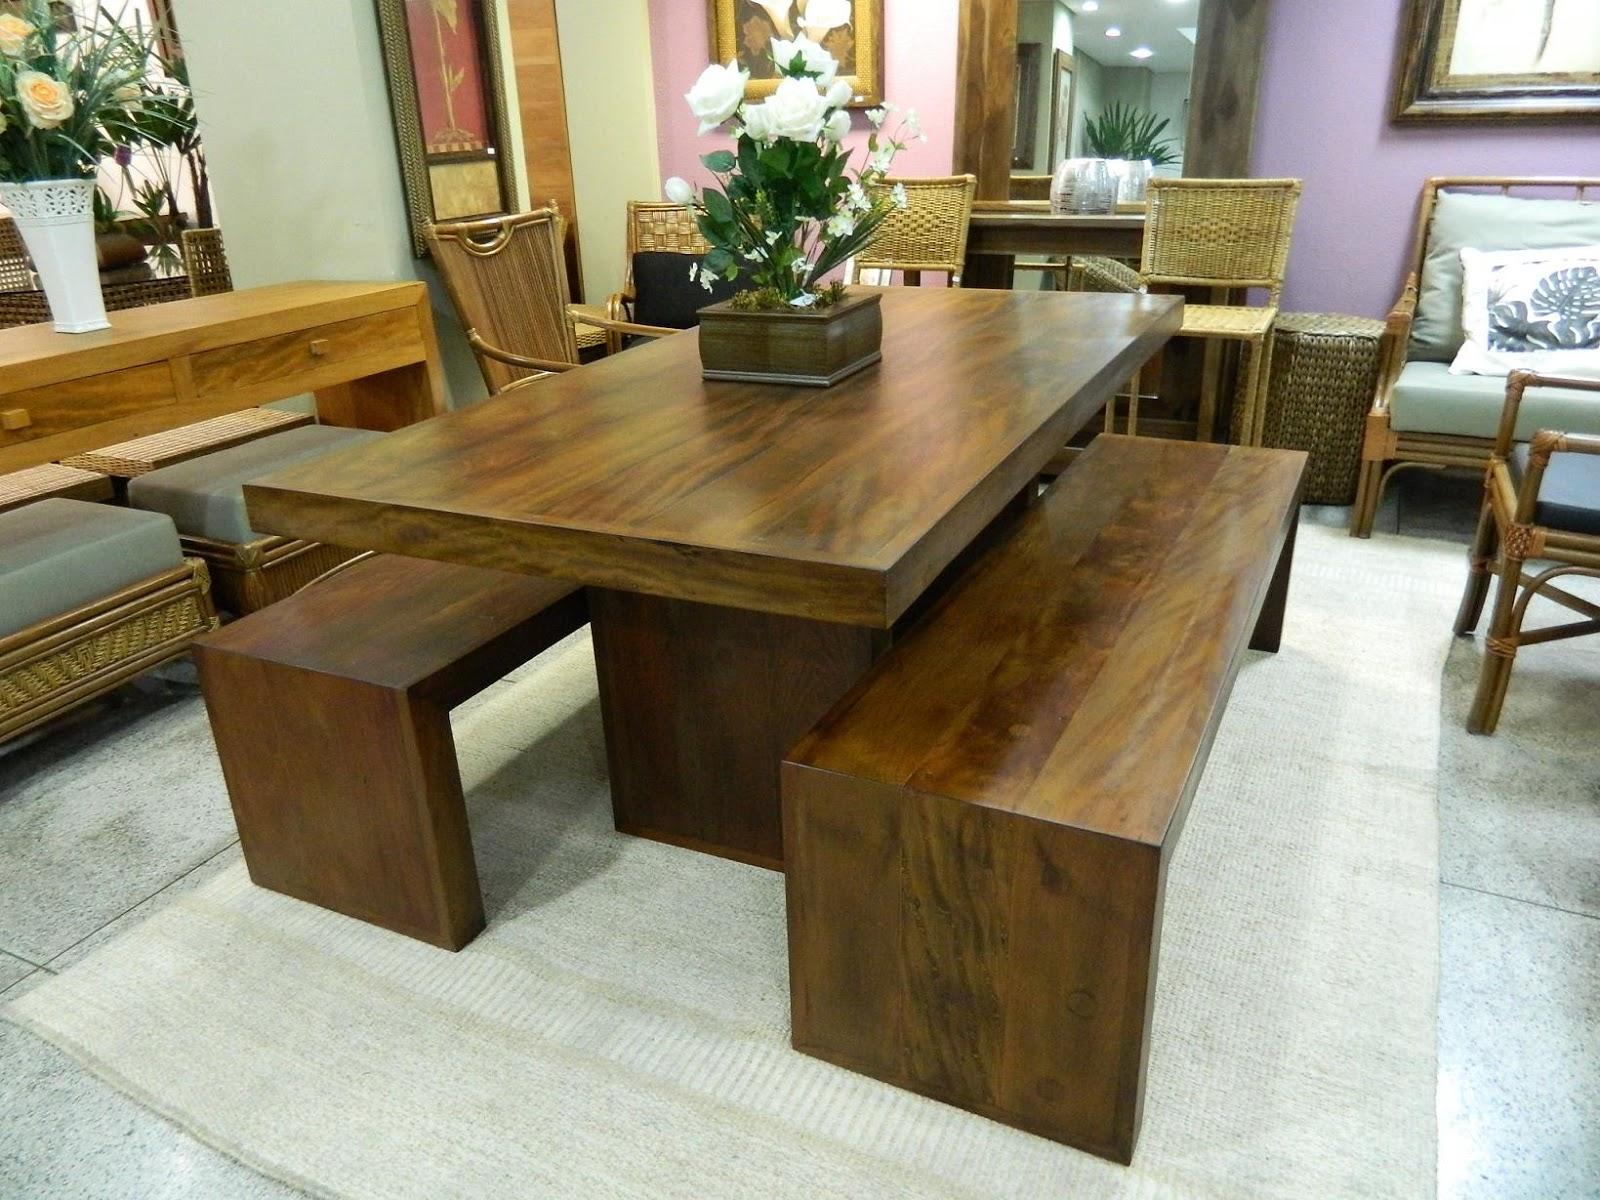 Lar sempre lar mesas de madeira inspiradoras for Modelos de mesas